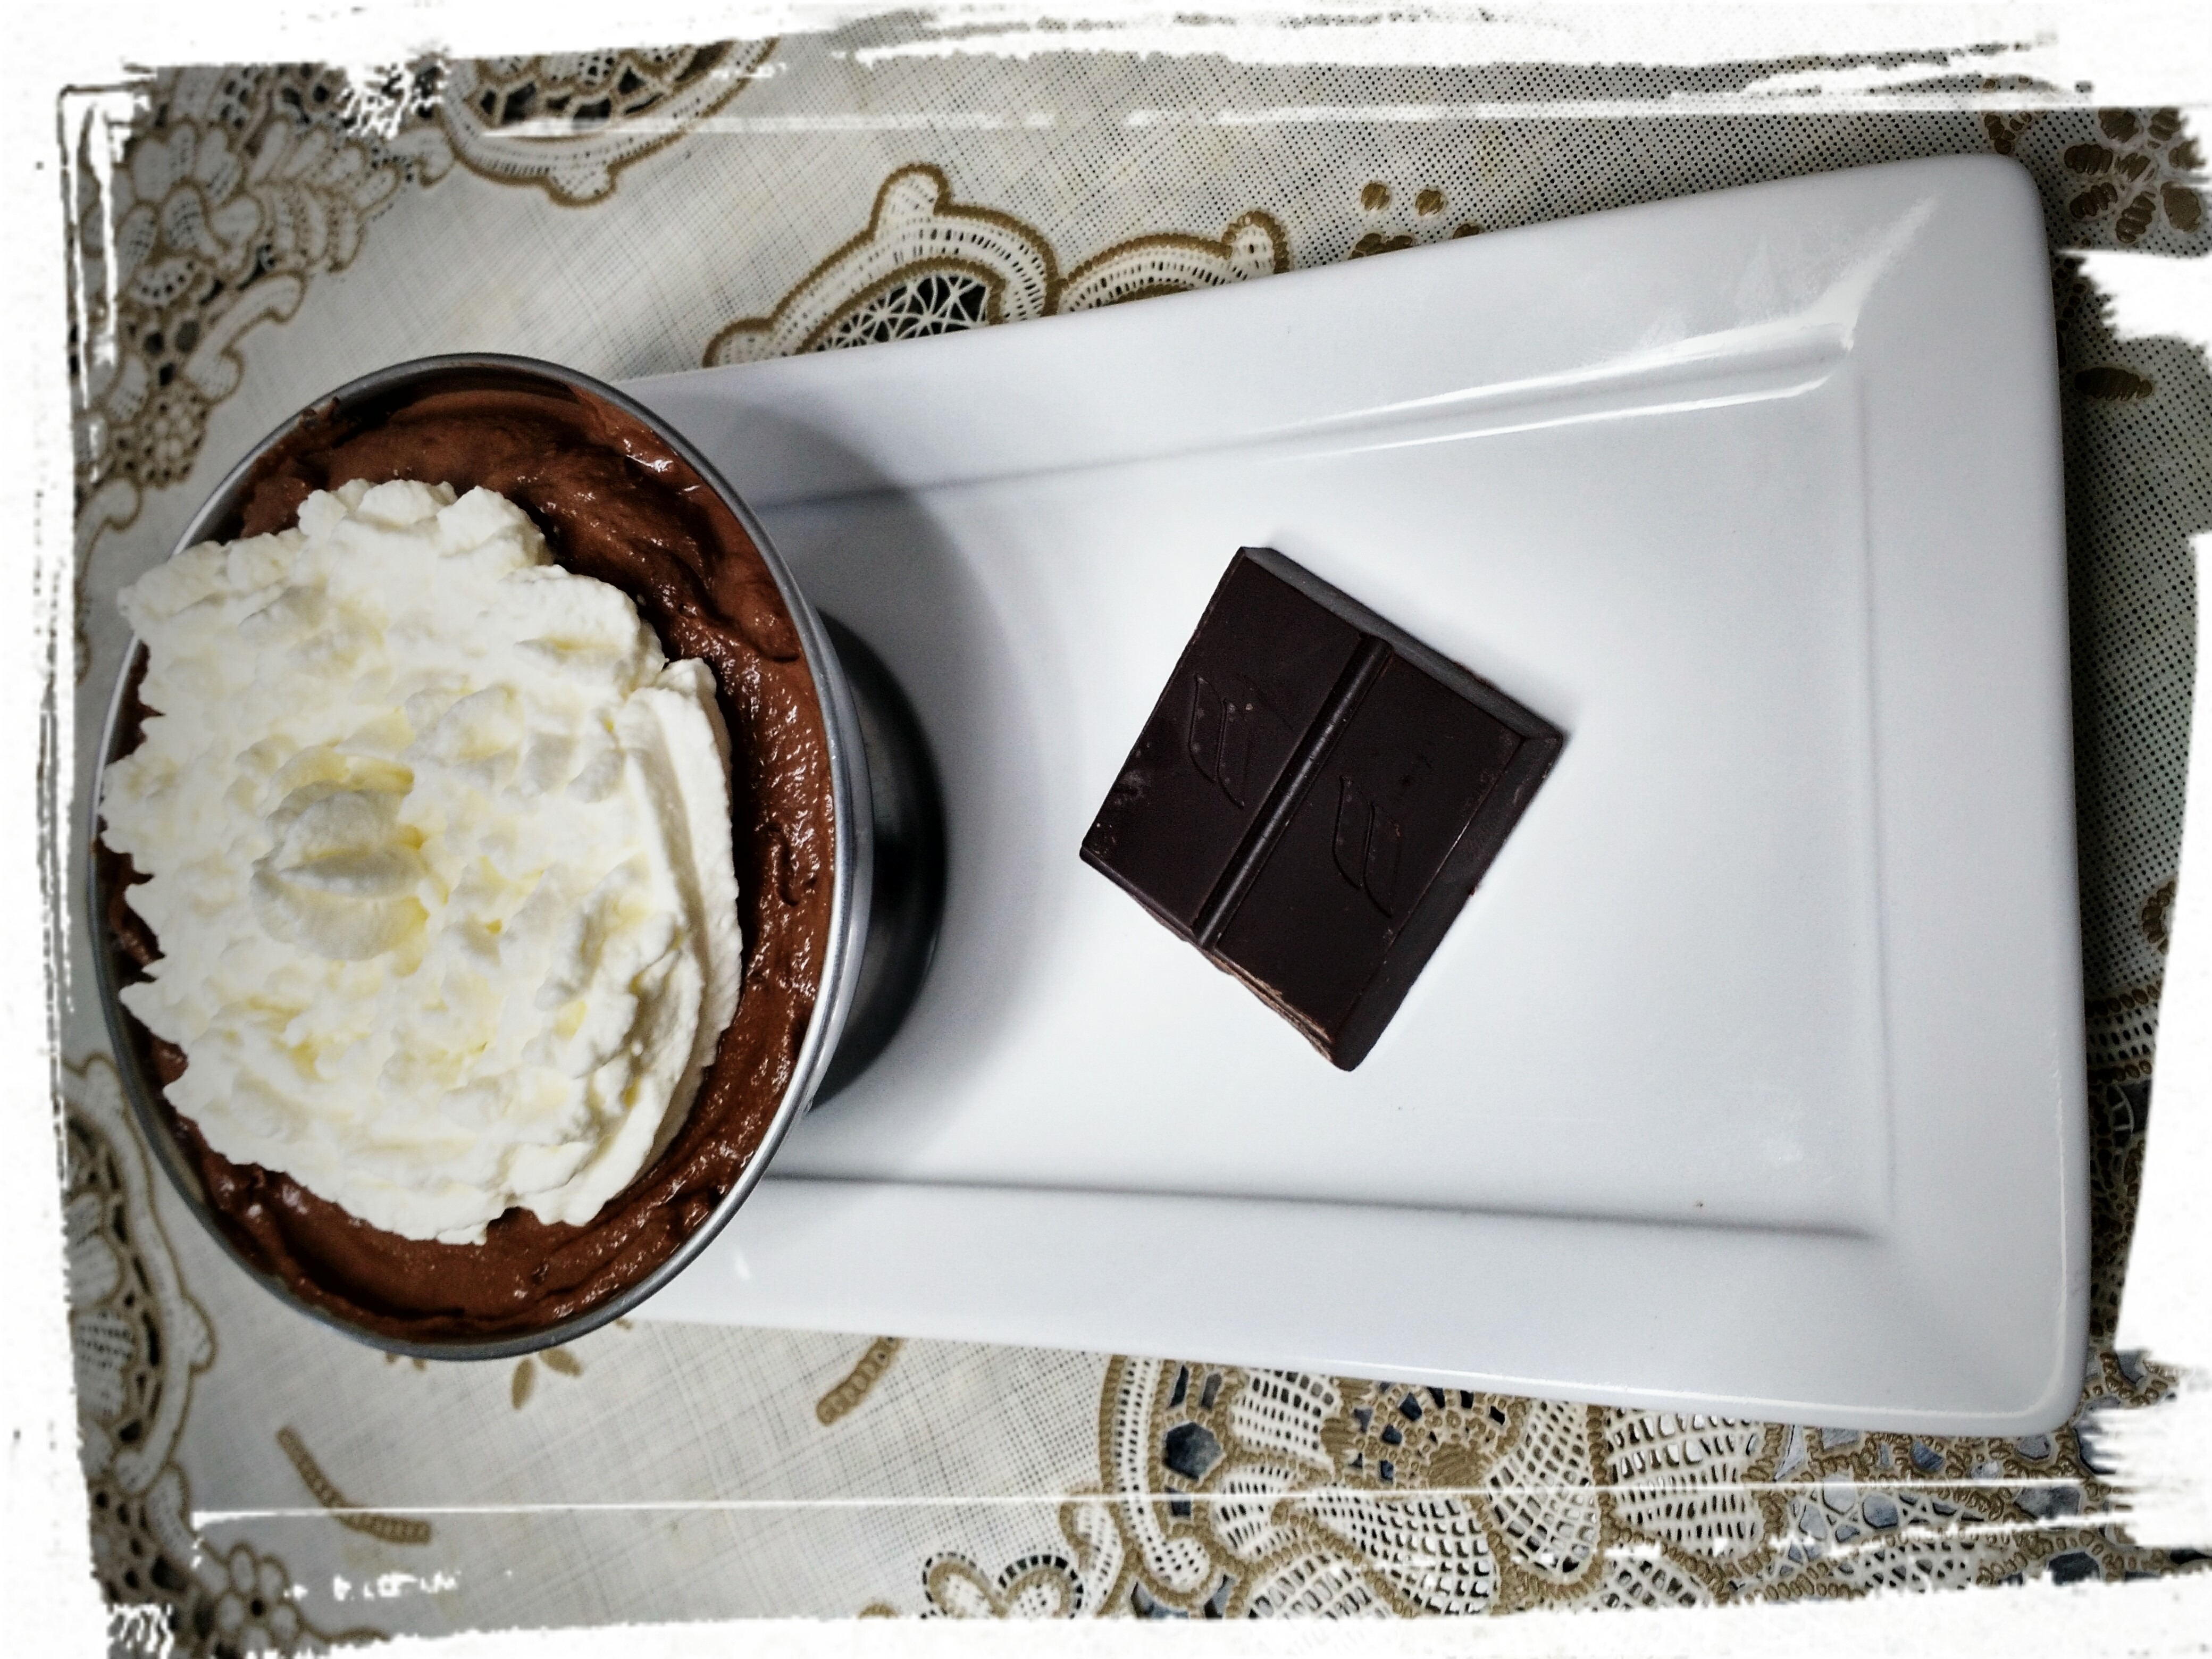 Mousse de chocolate lowcarb (85% cacau)